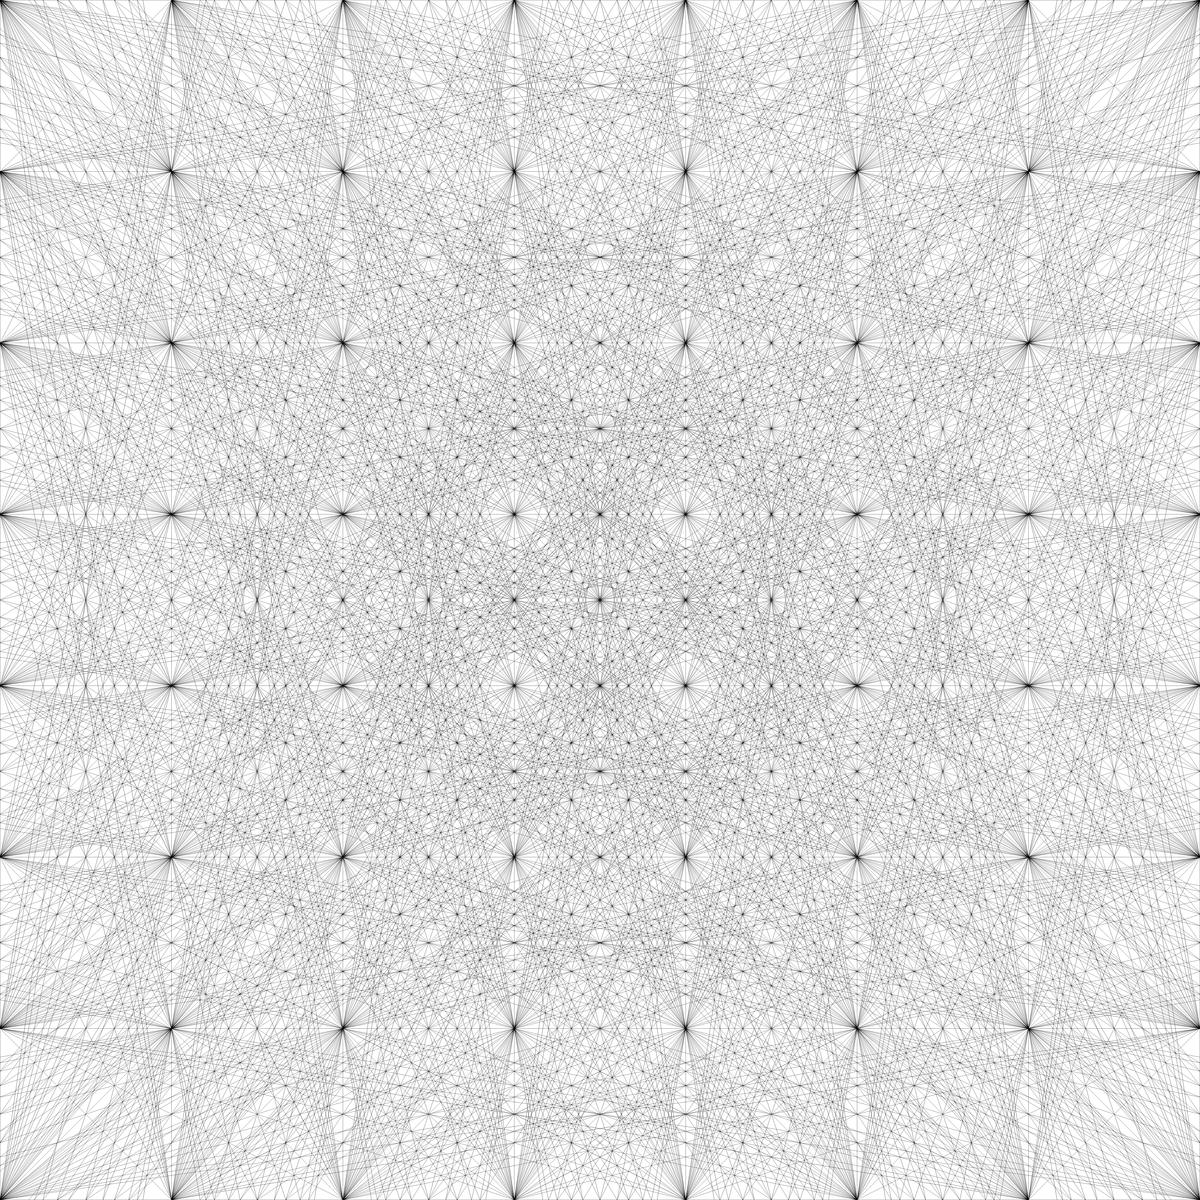 f:id:Hassium277:20200218213847p:plain